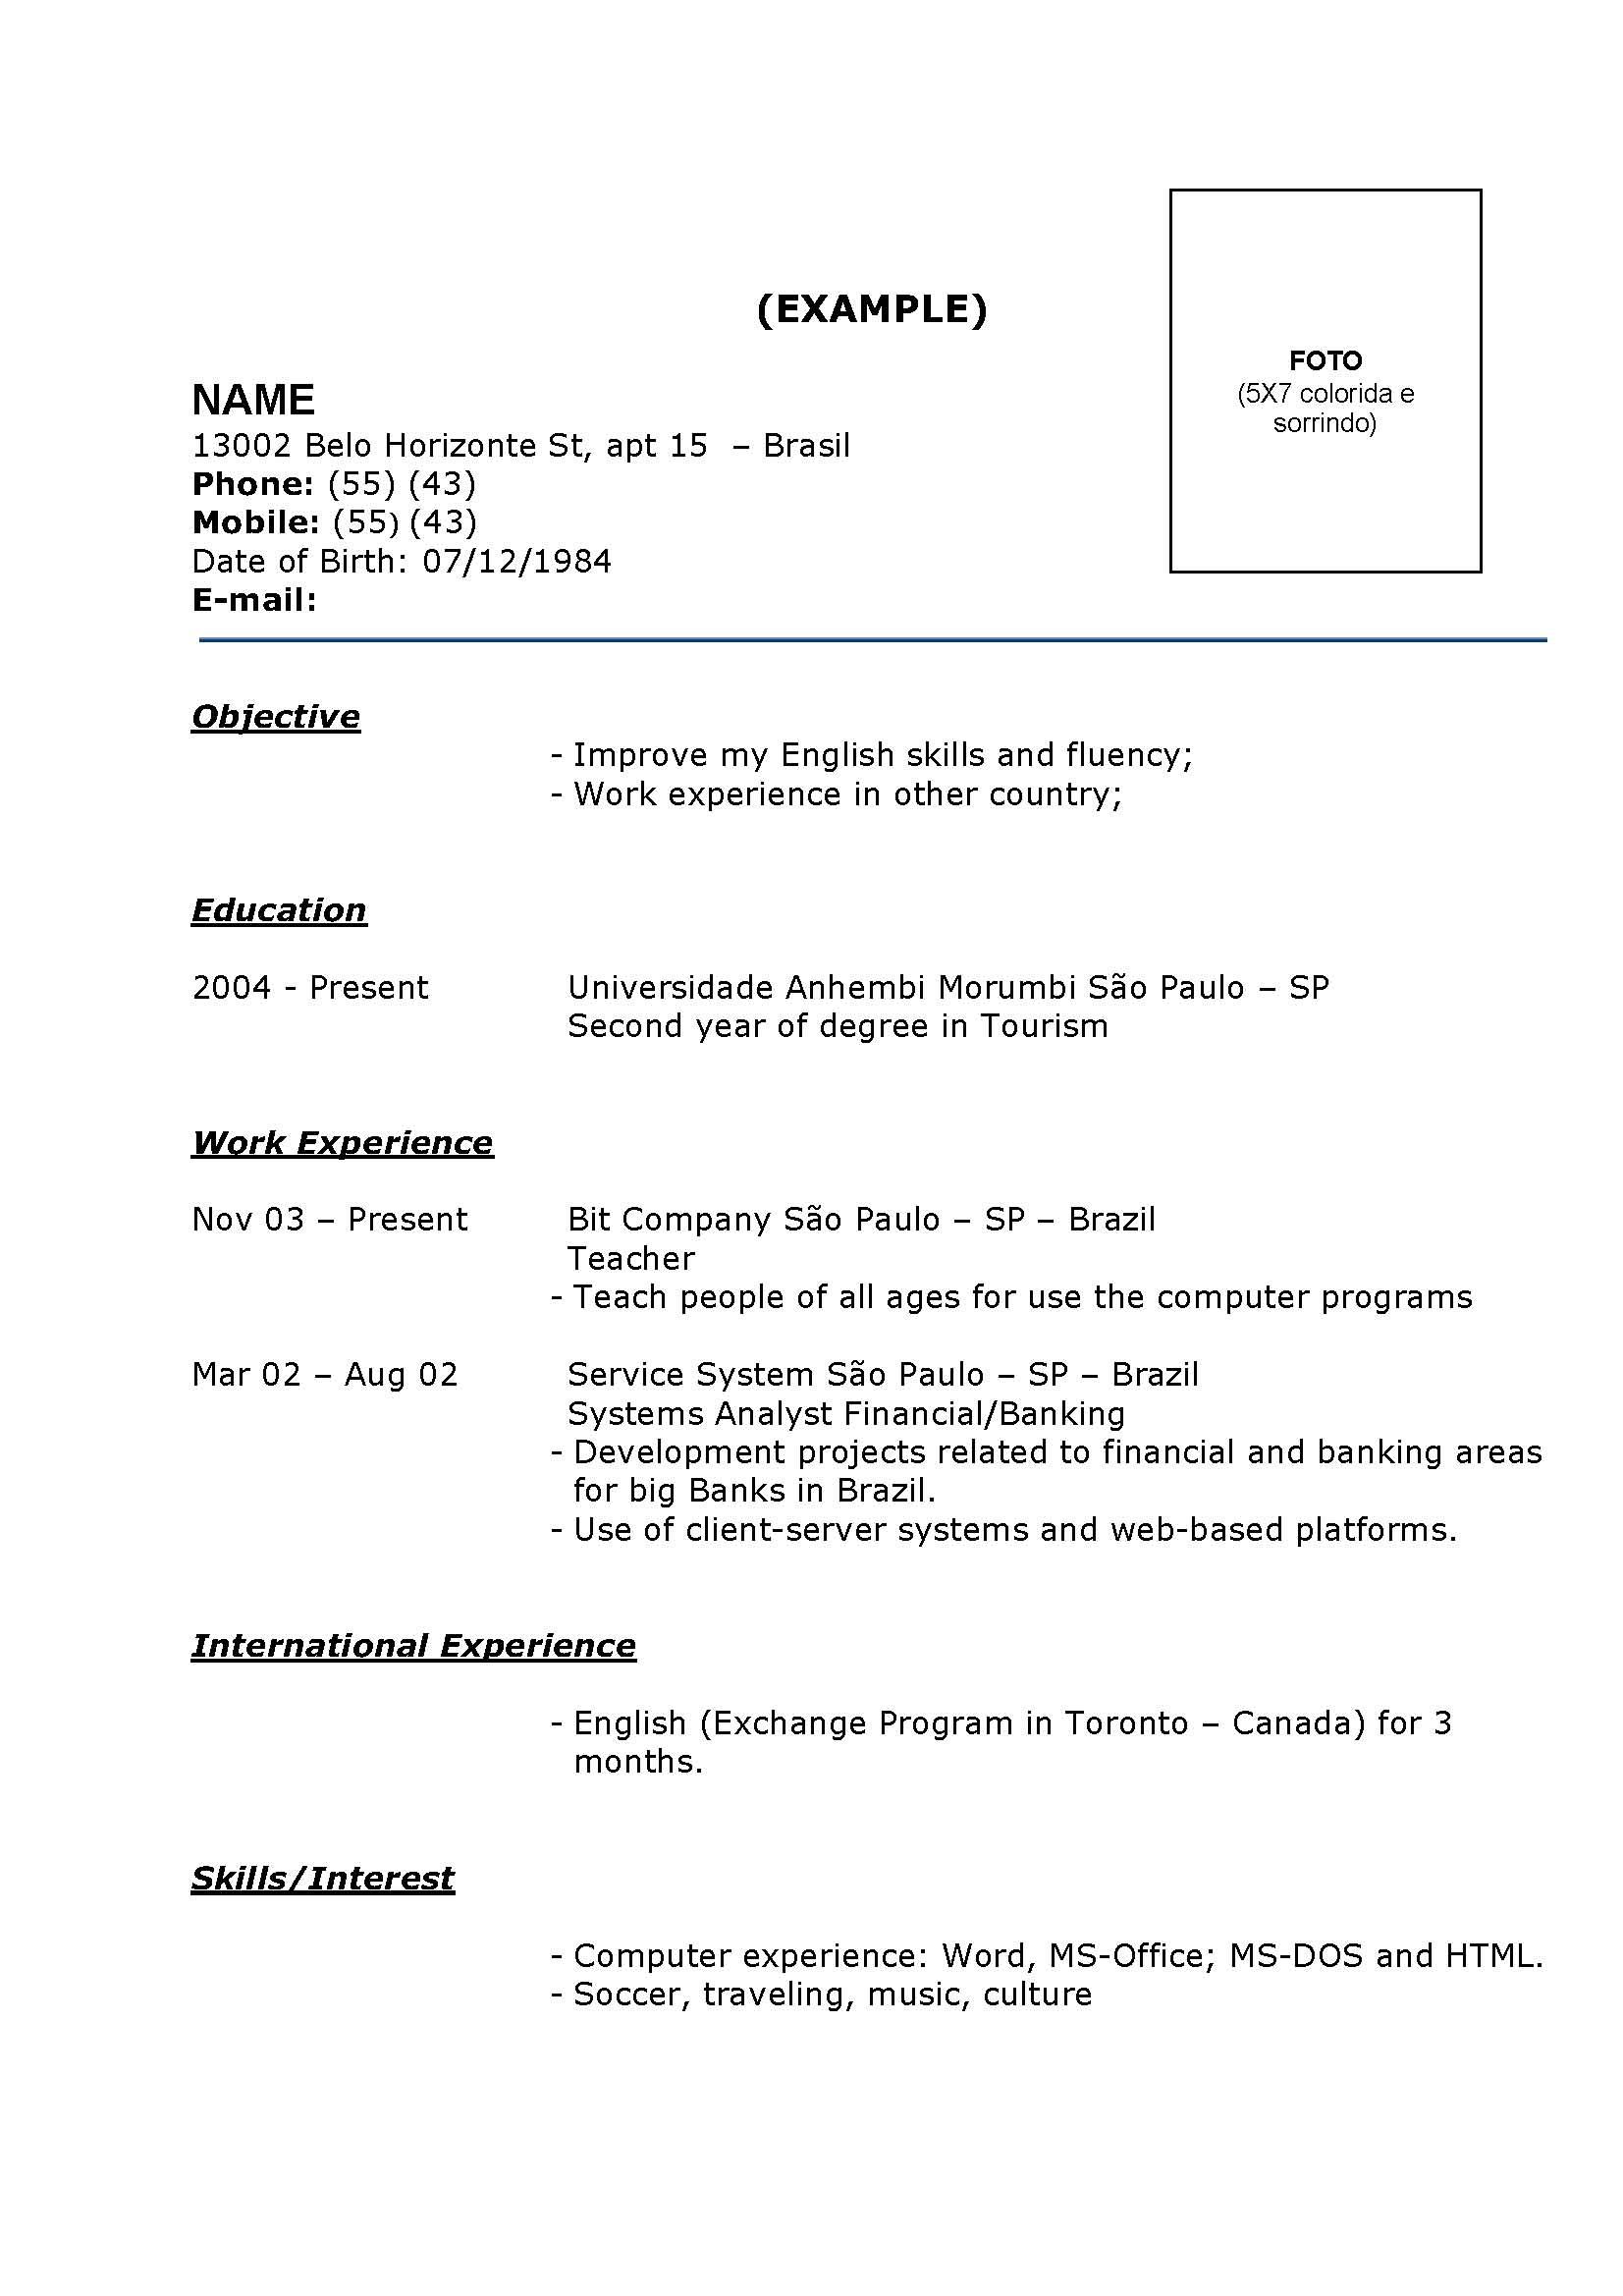 Modelo De Currículo Pronto Exemplos Grátis